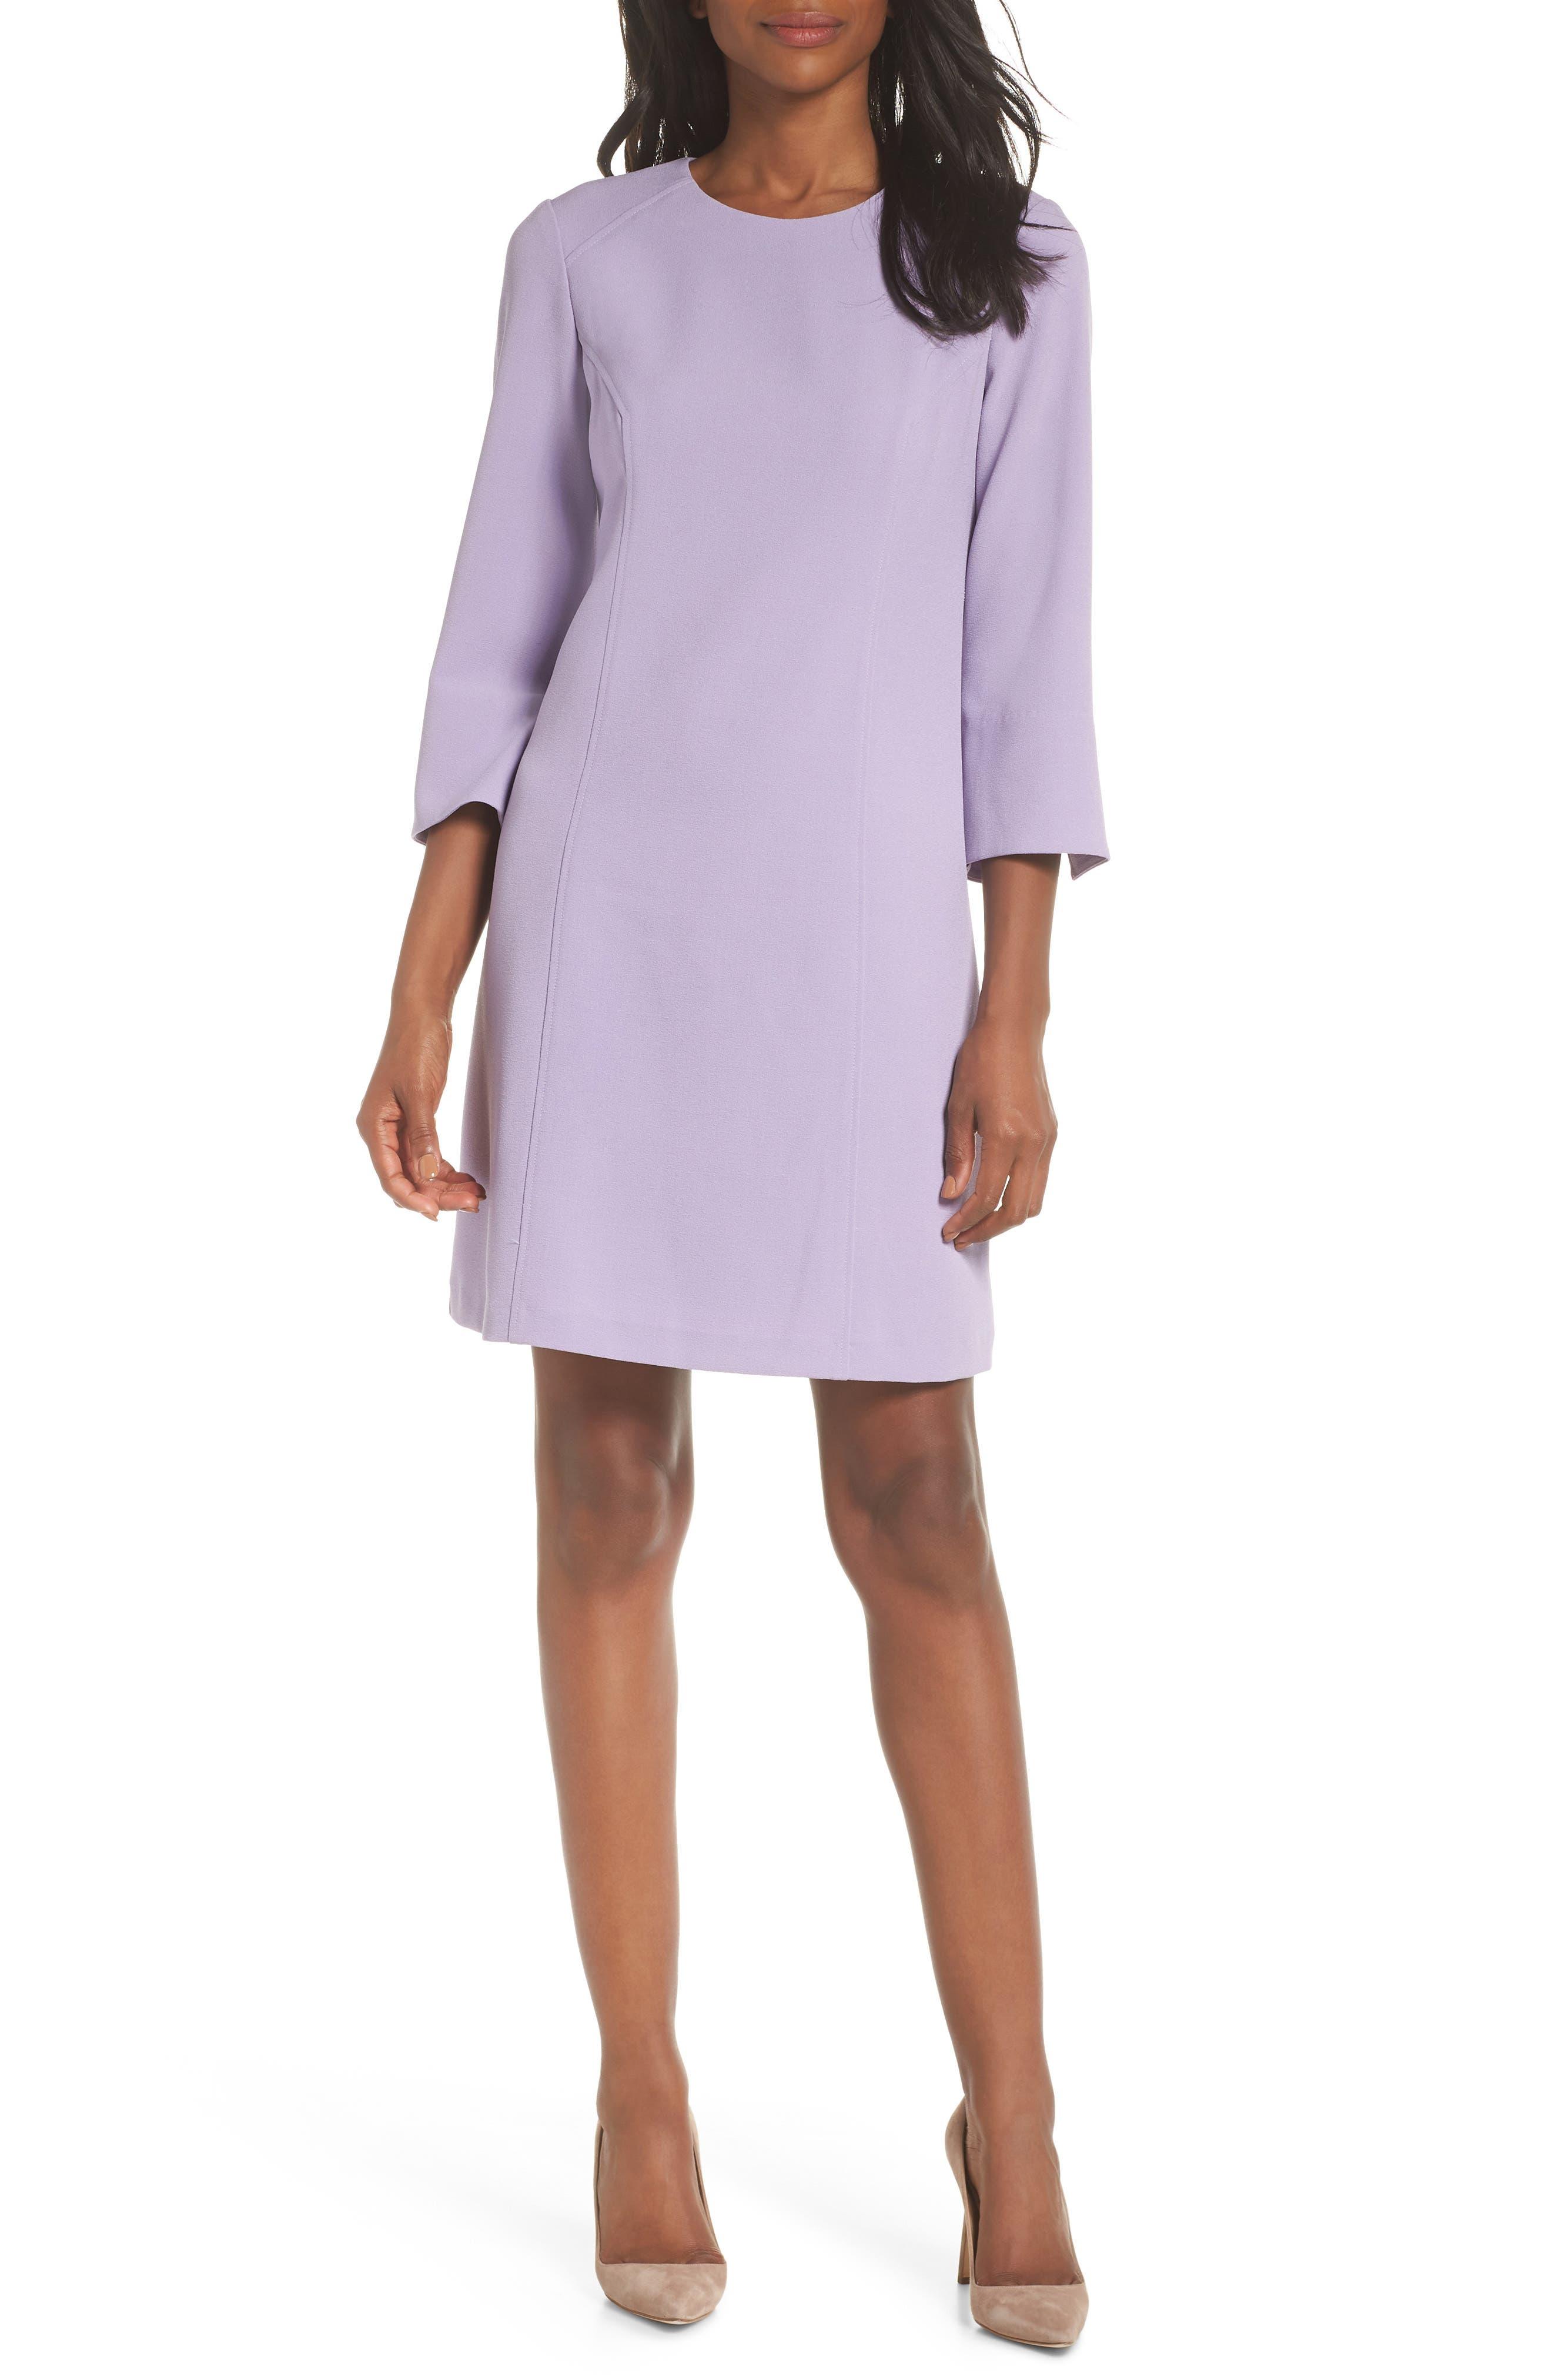 VINCE CAMUTO Kors Crepe Shift Dress, Main, color, LILAC